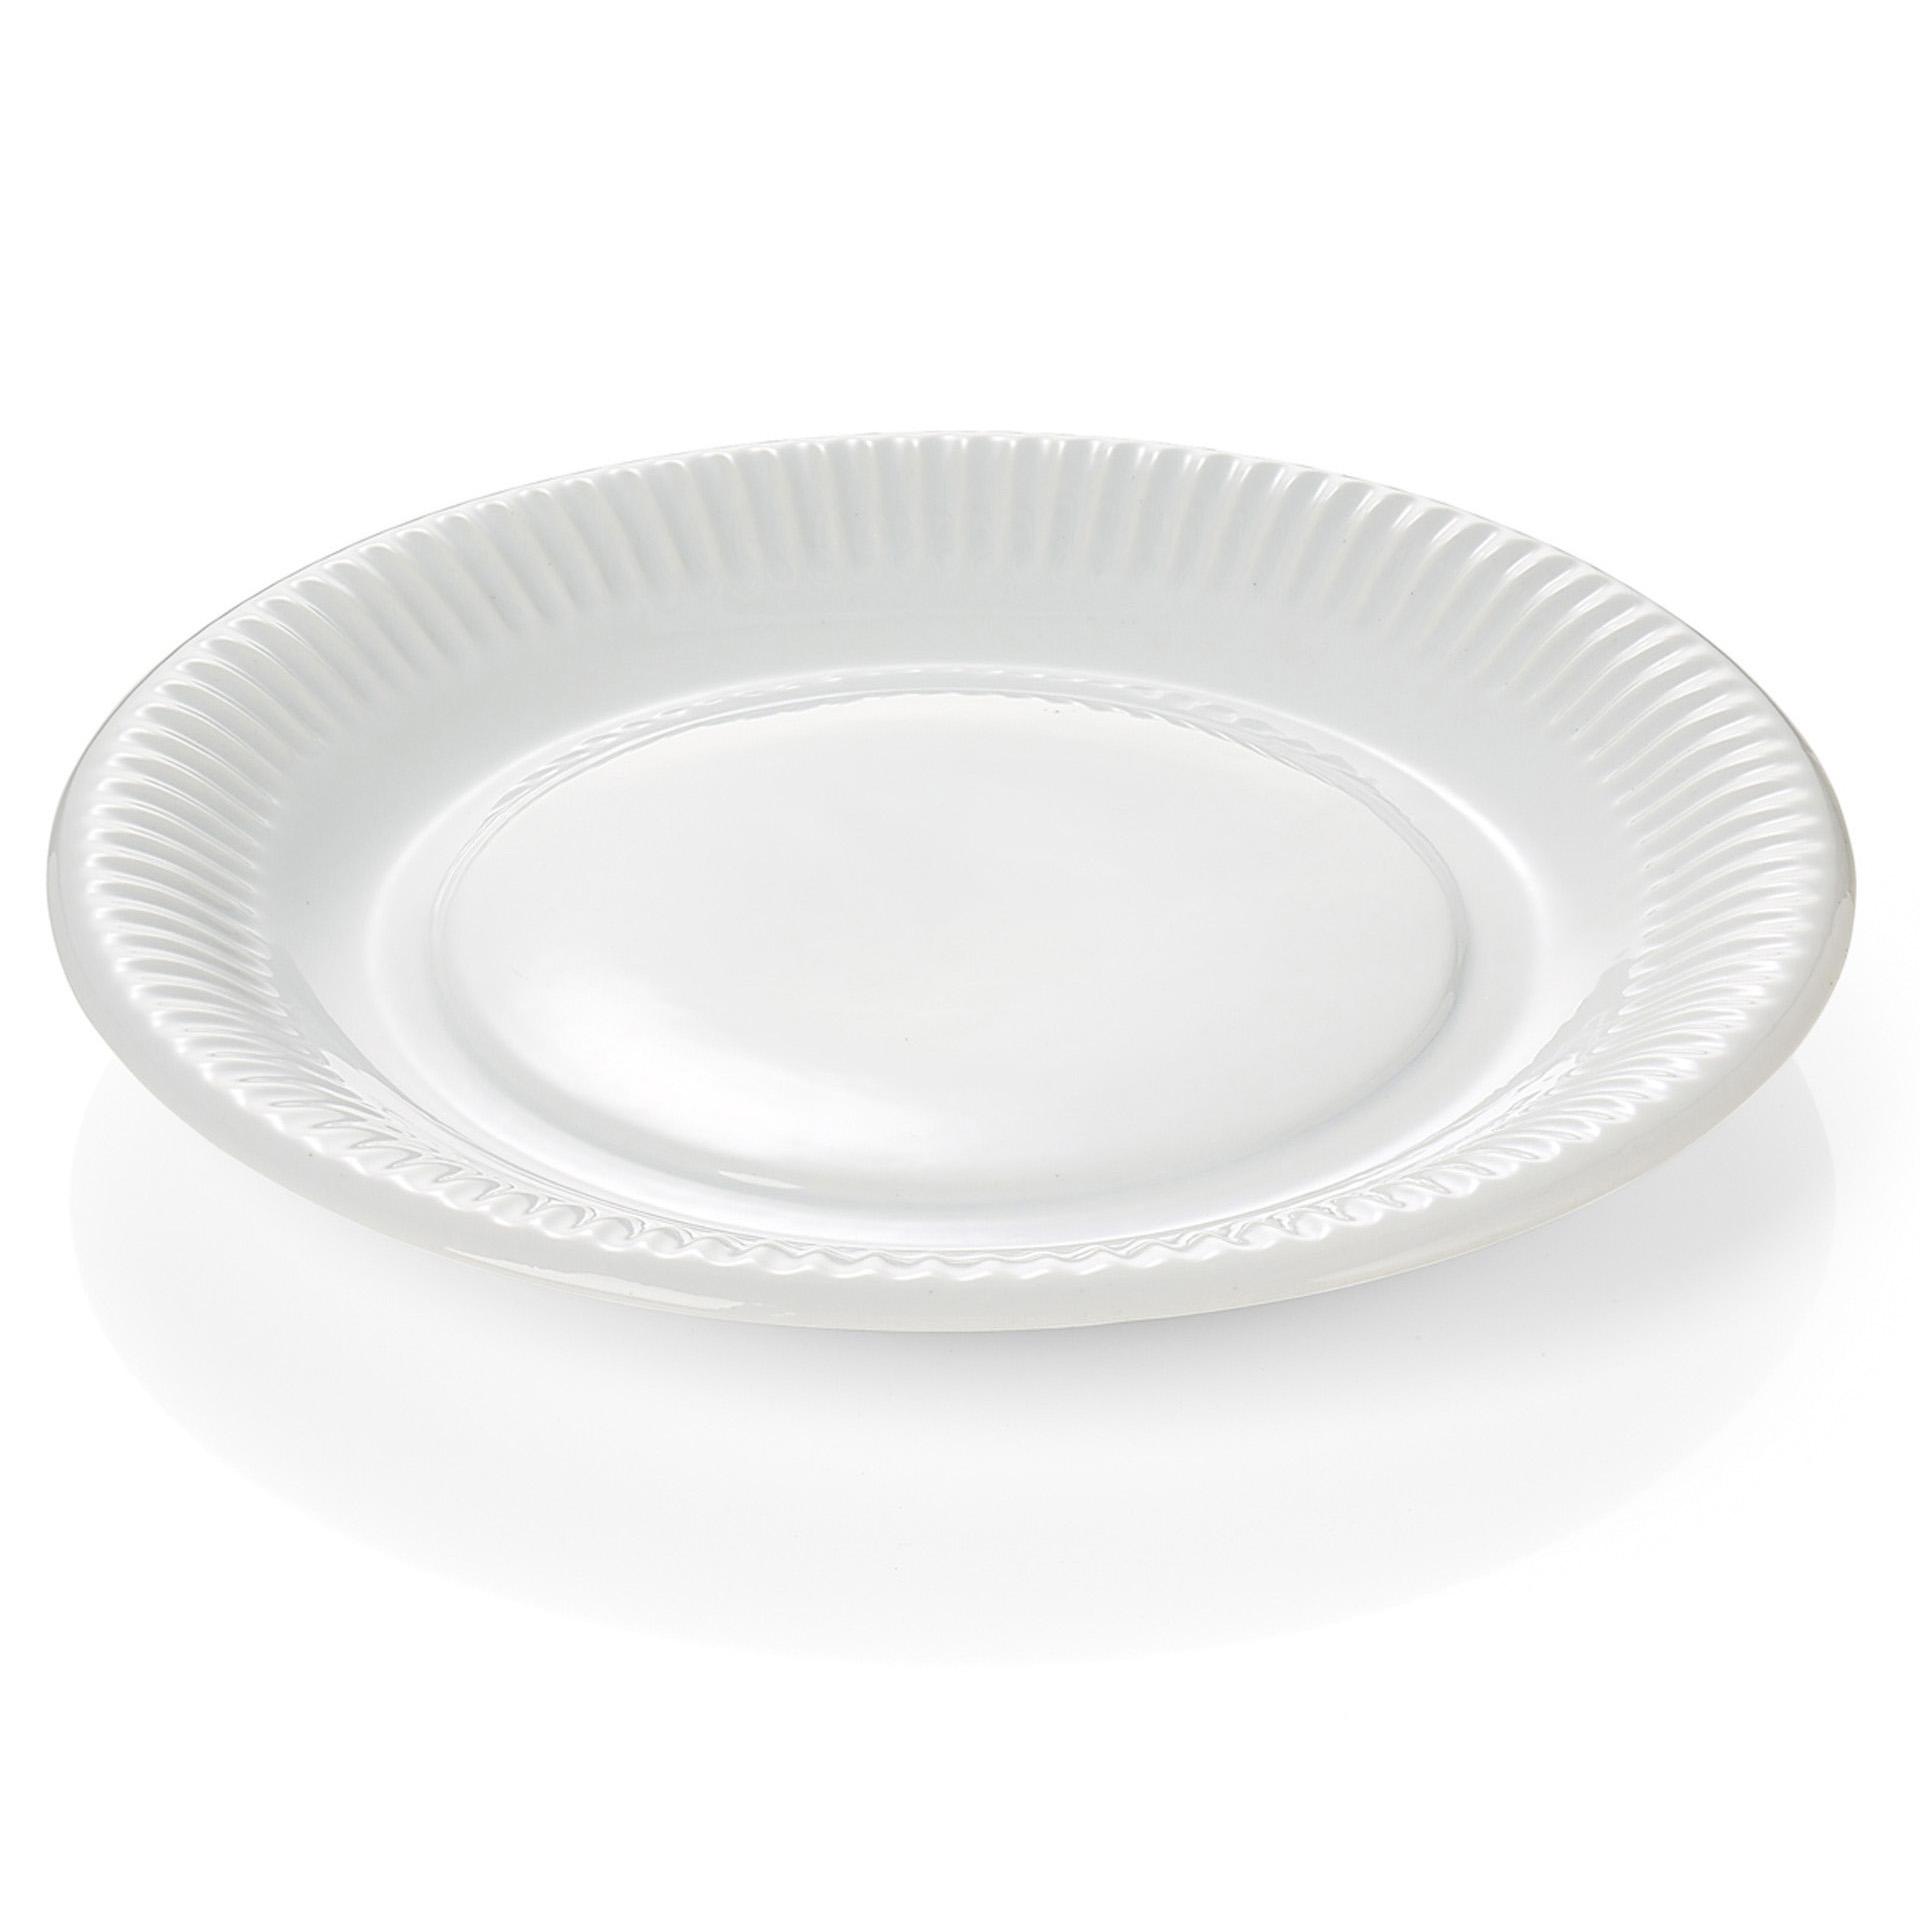 6 er Set Ess-Teller Durchmesser 28cm  Melamin Geschirr